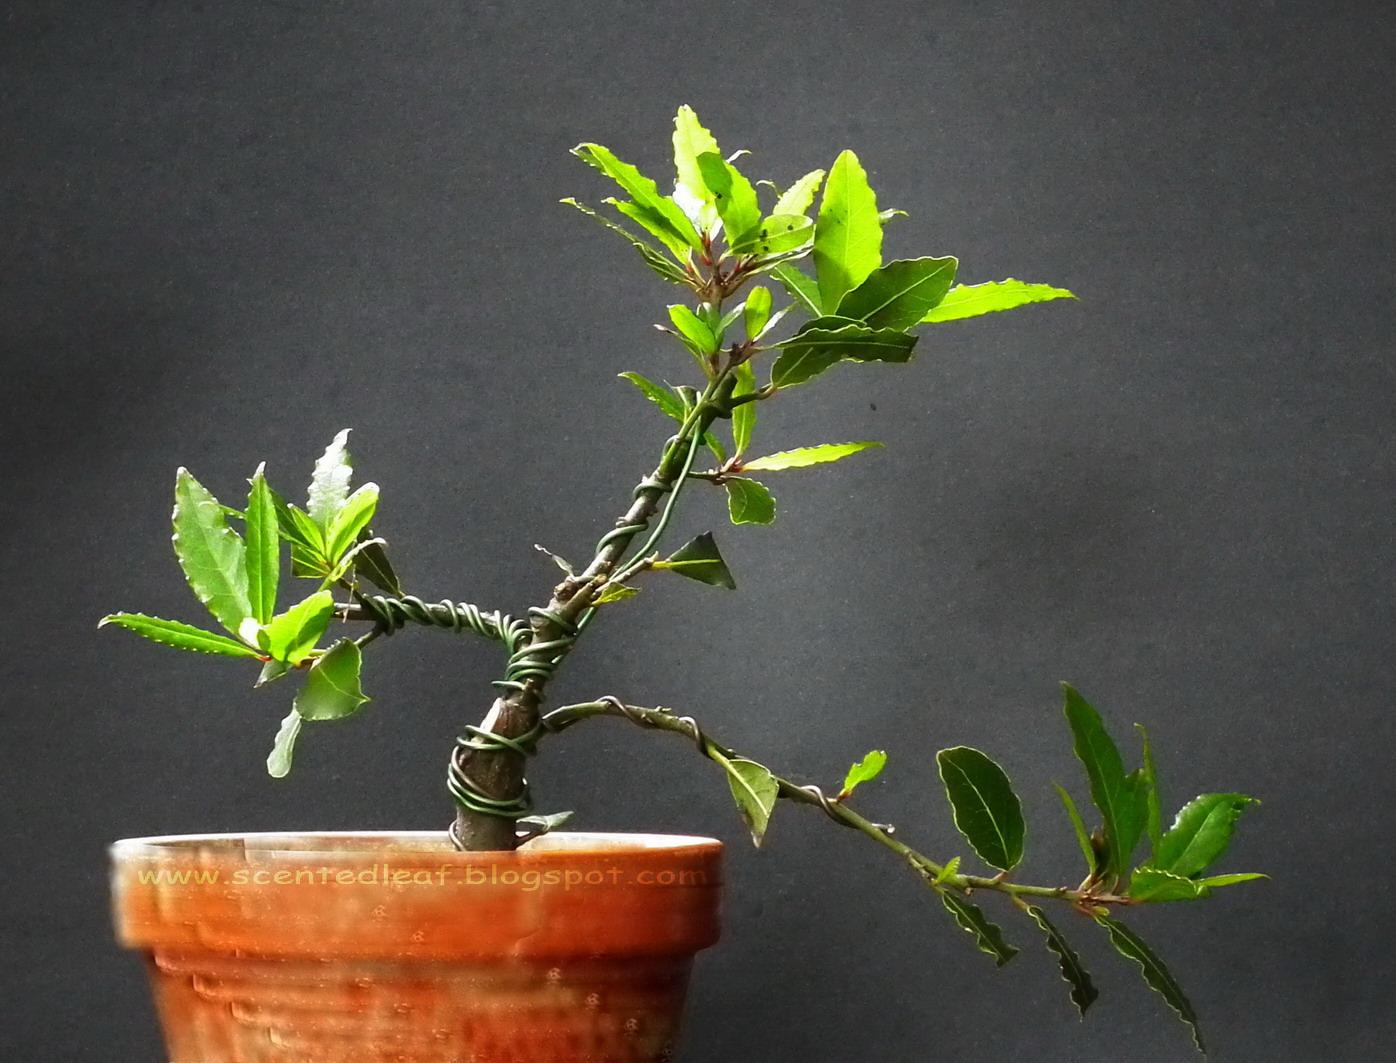 Scented Leaf Bay Laurel Bonsai